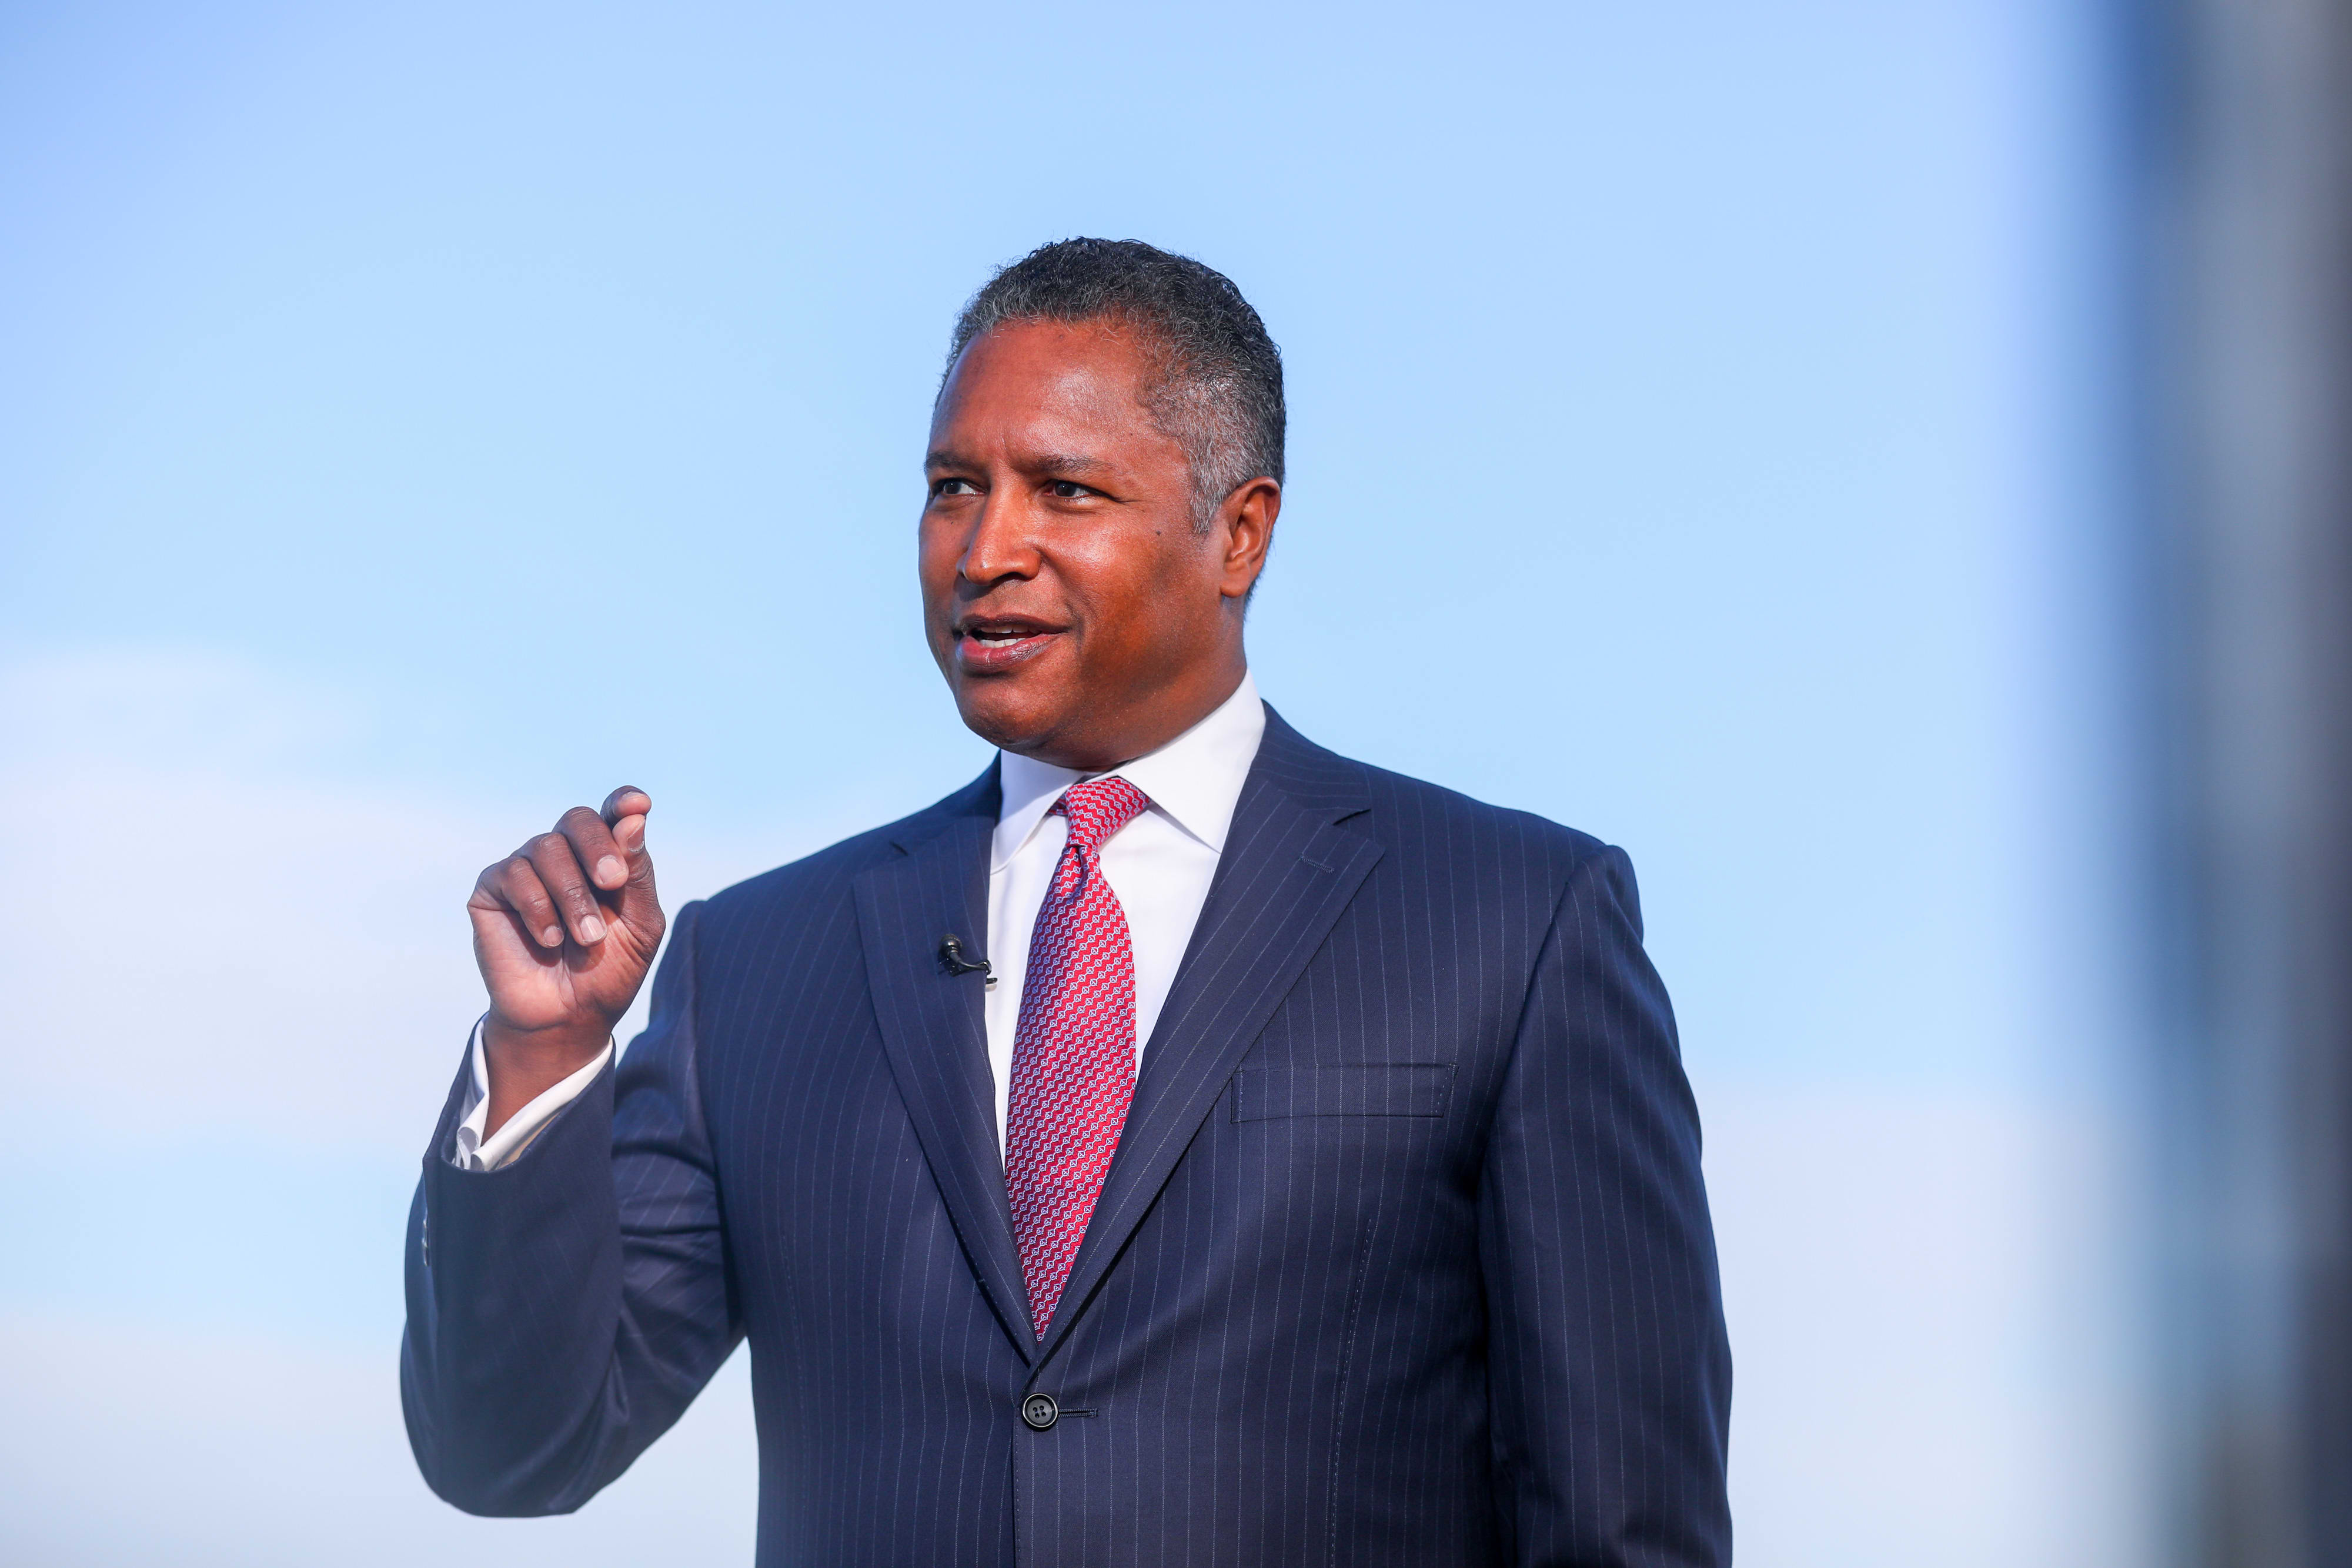 Raytheon International CEO dismisses Trump's concerns about United Technologies merger